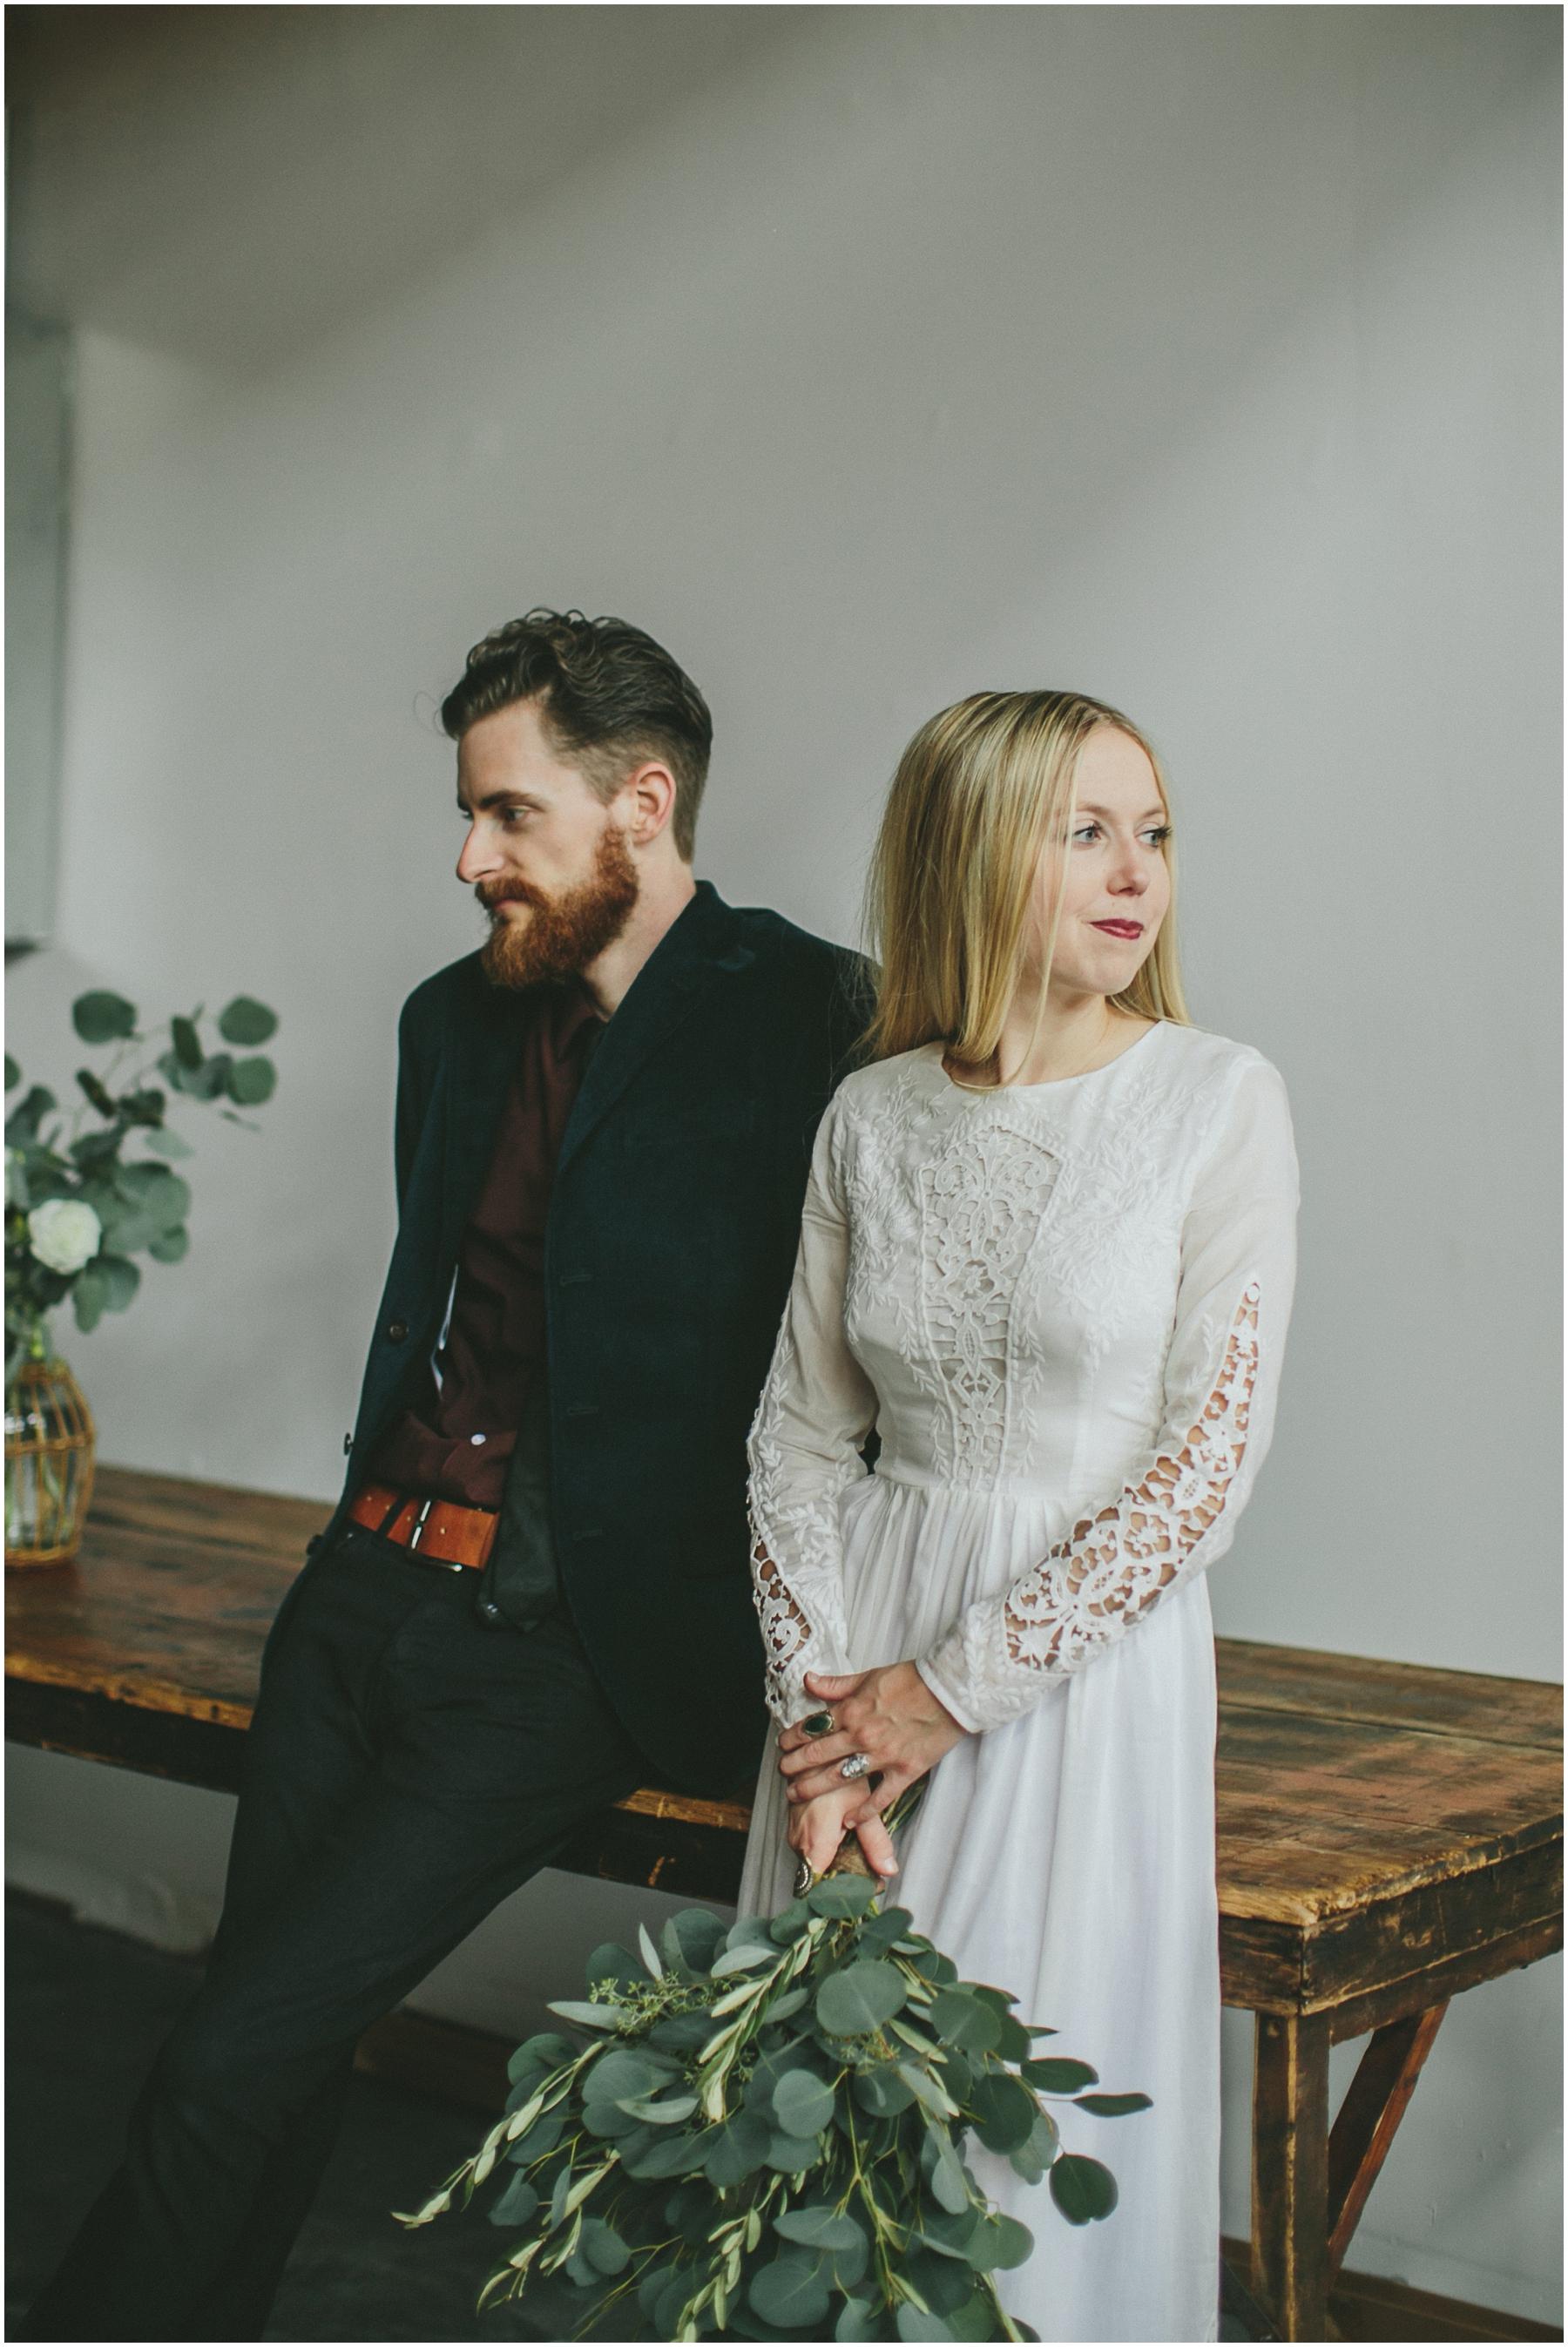 Natalie+Corey-WEDDING_KELLYBOITANO_0046